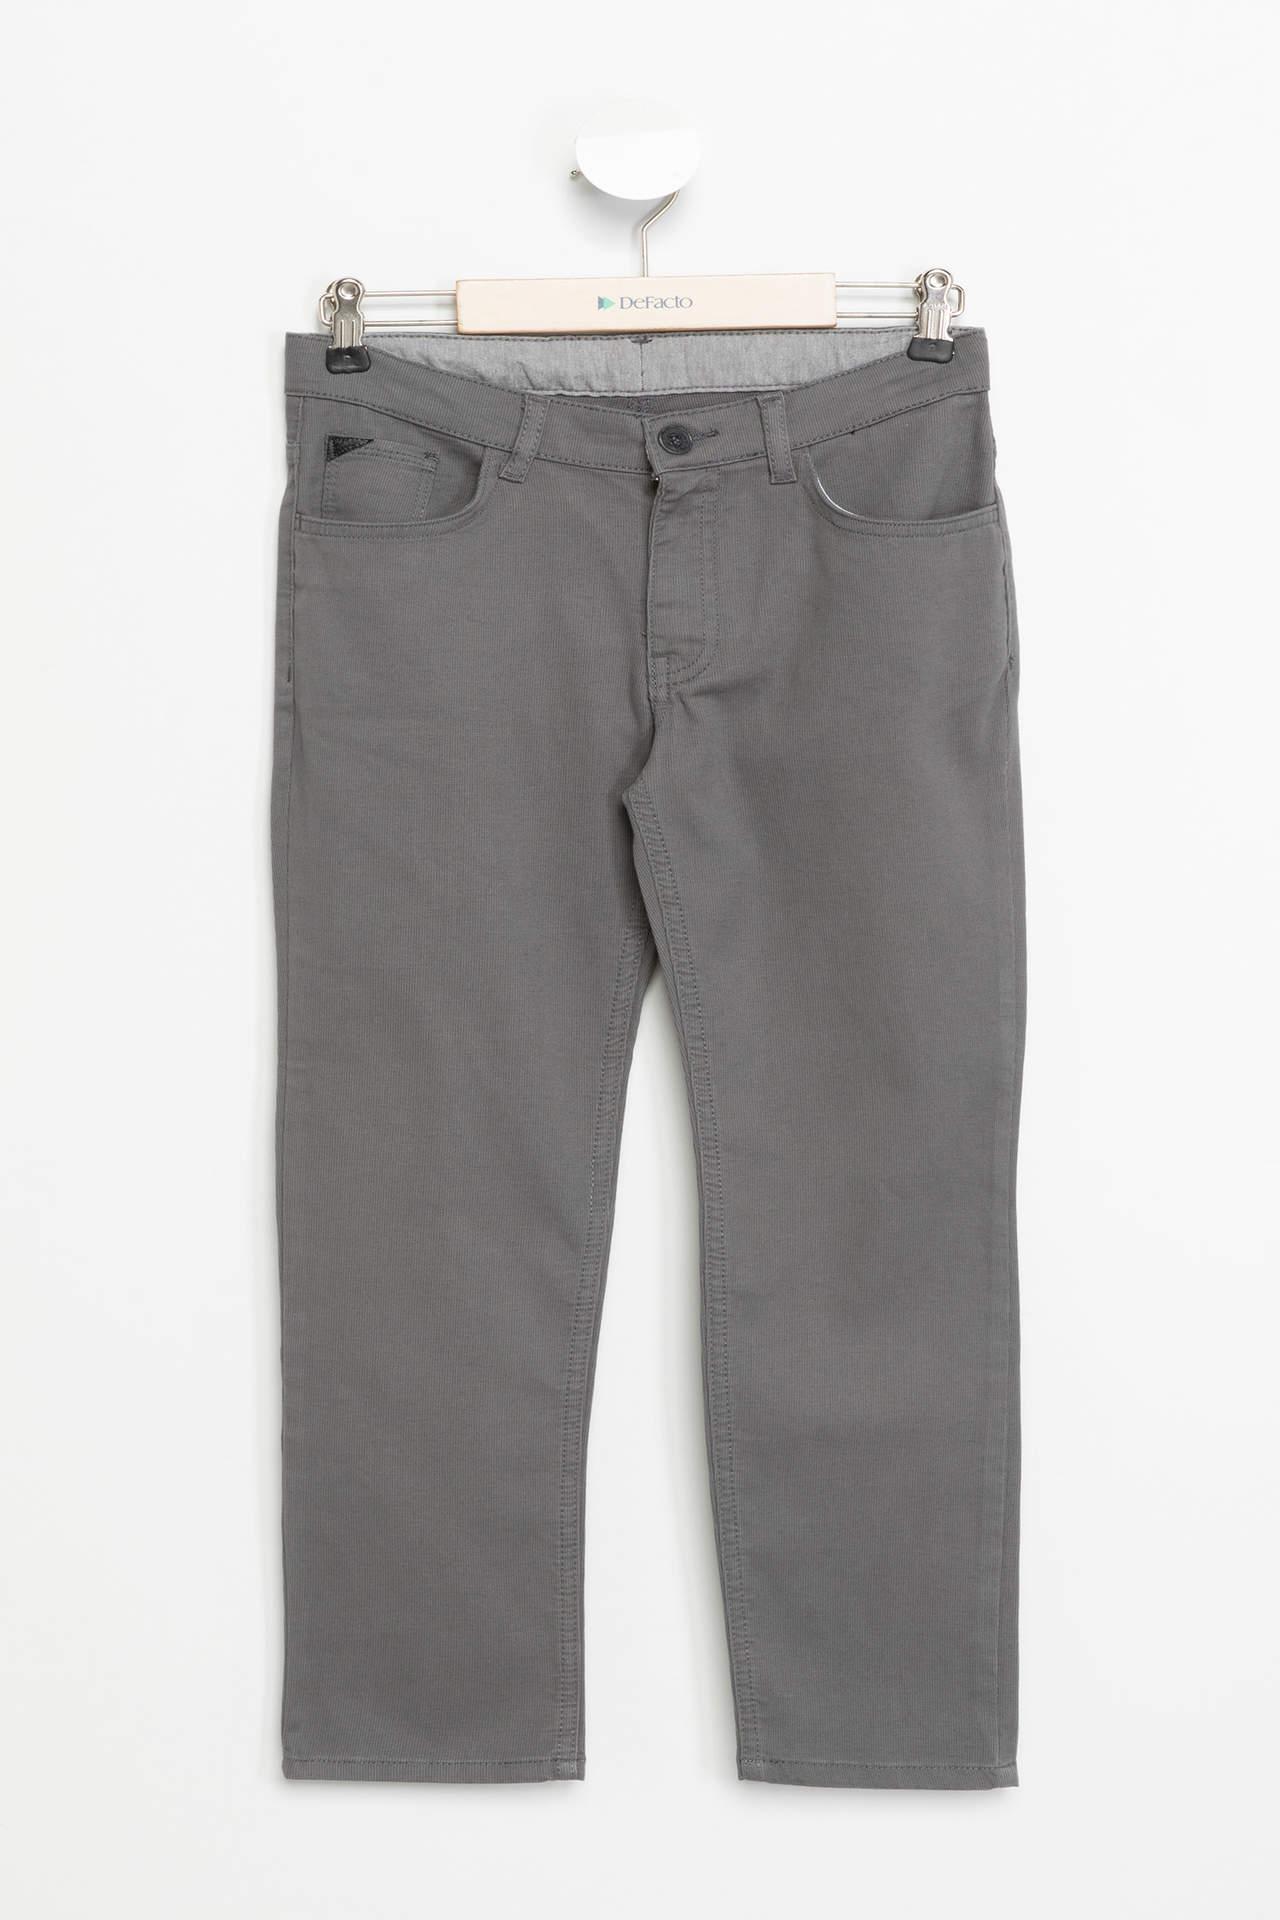 DeFacto Erkek Çocuk Slim Fit Pantolon Gri male